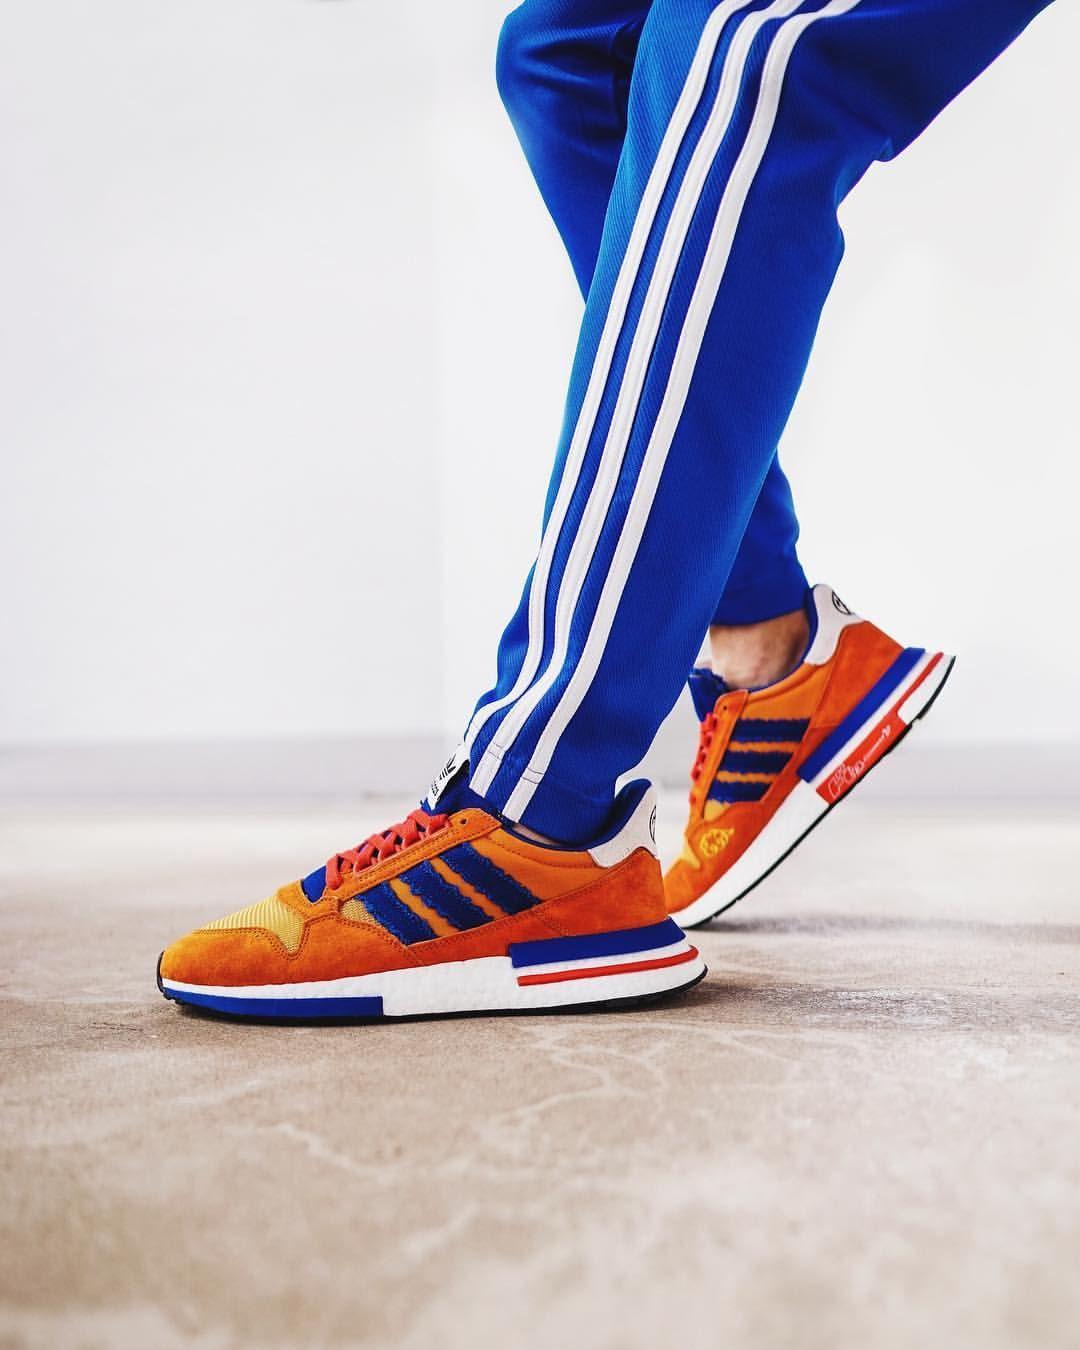 Dragonball Z x adidas Originals ZX 500 RM | Zapatos hermosos